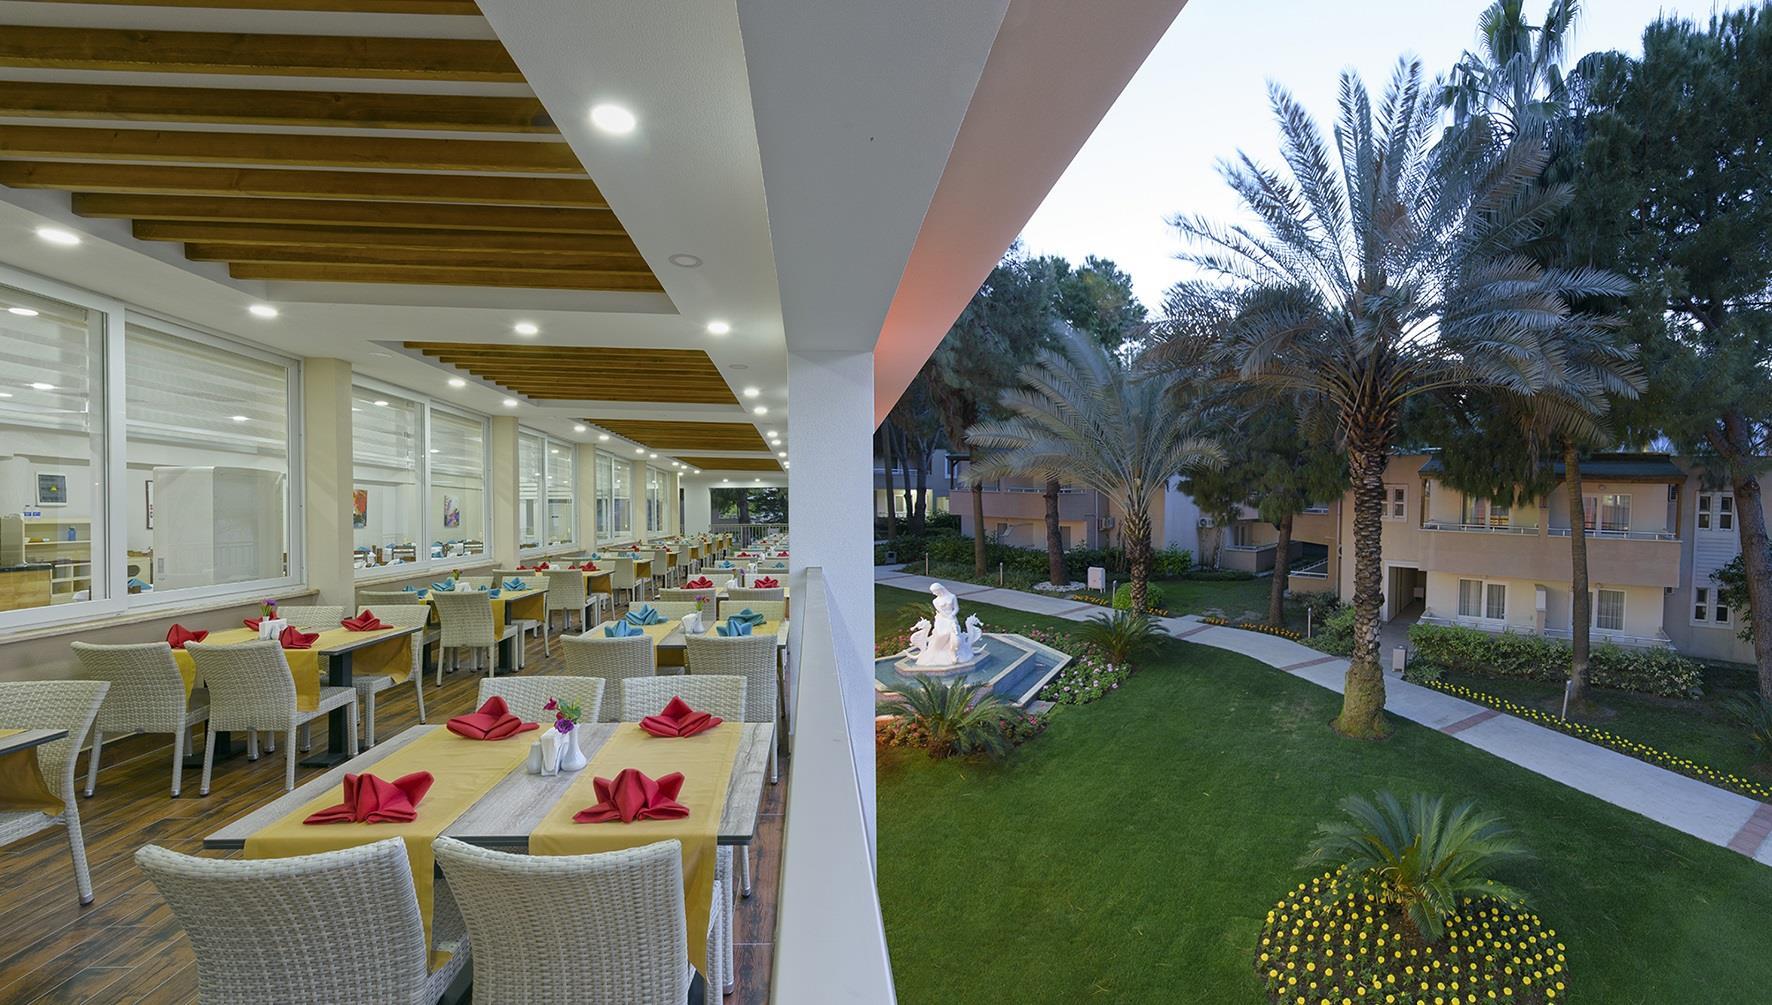 http://www.orextravel.sk/OREX/hotelphotos/club-sidelya-hotel-general-0041.jpg